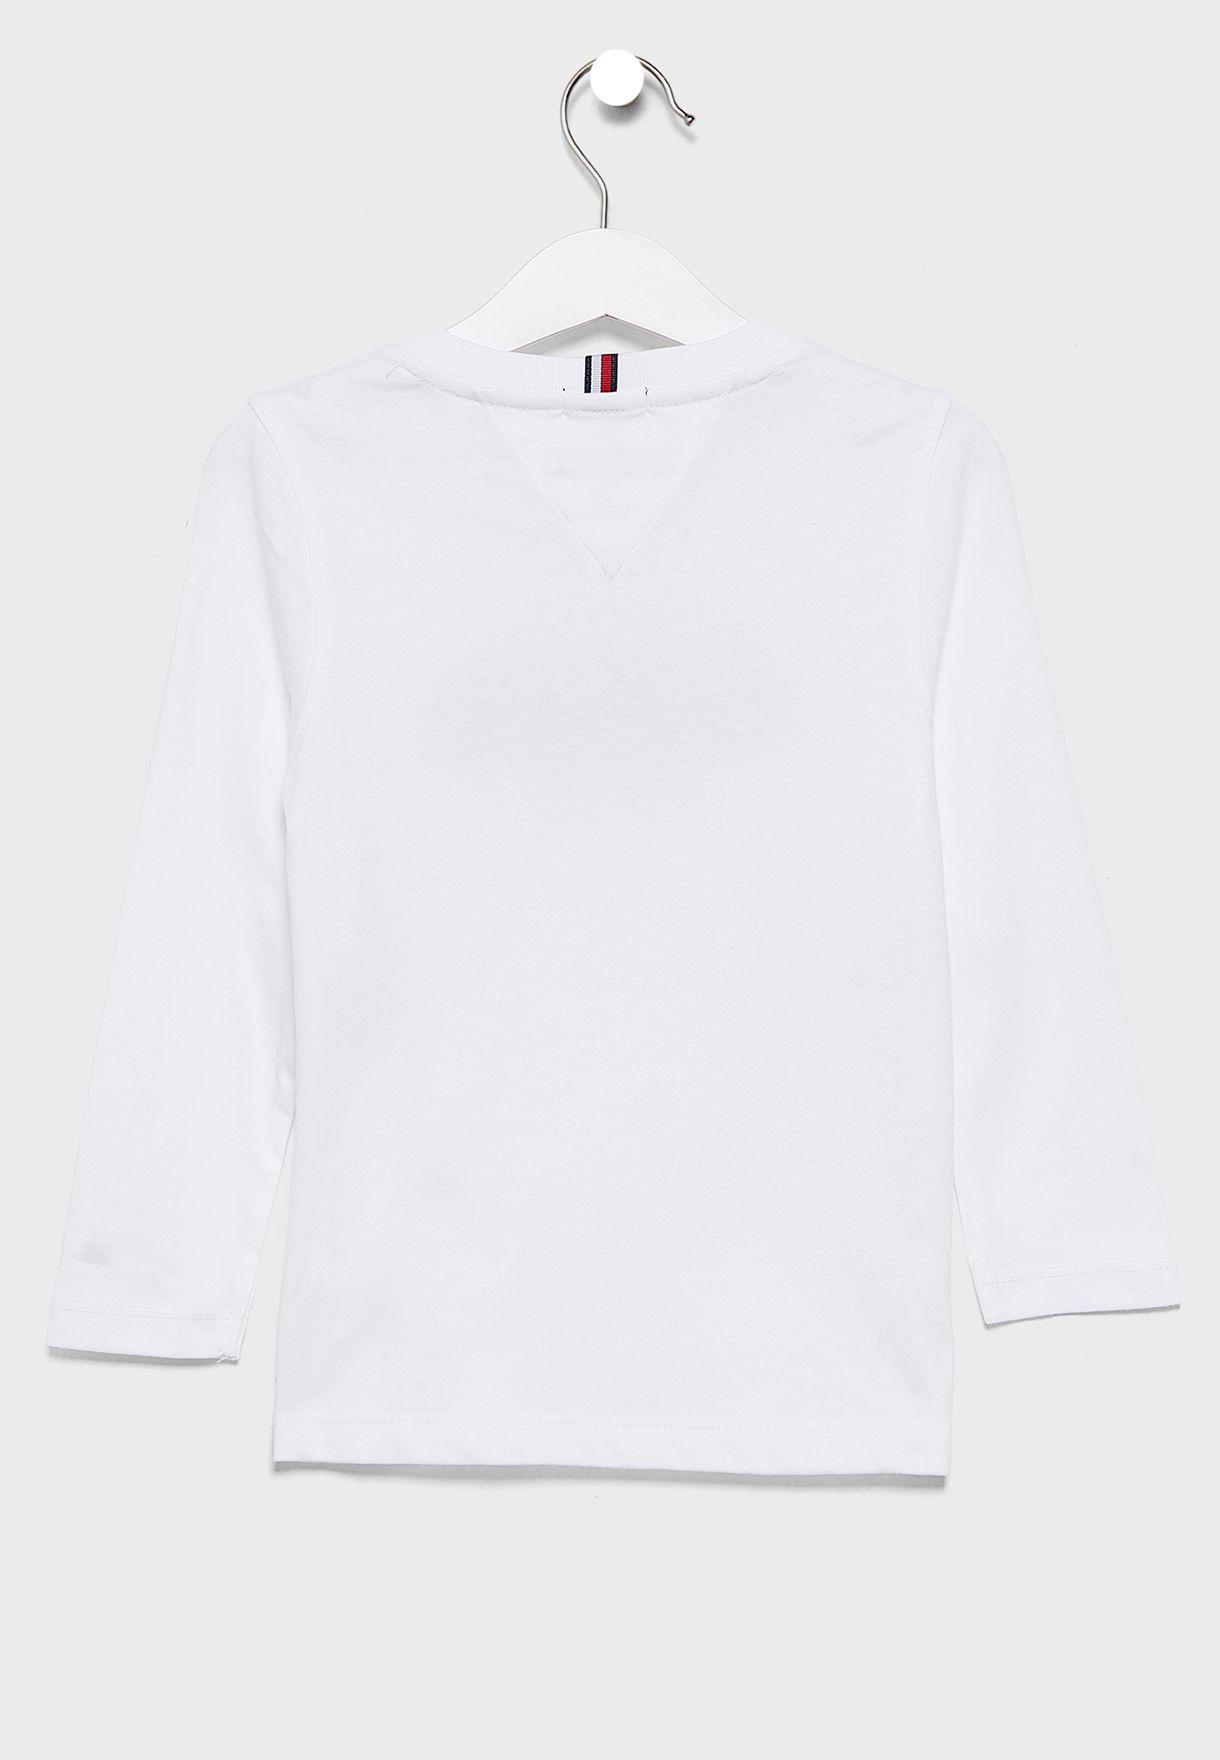 Little NYC T-Shirt